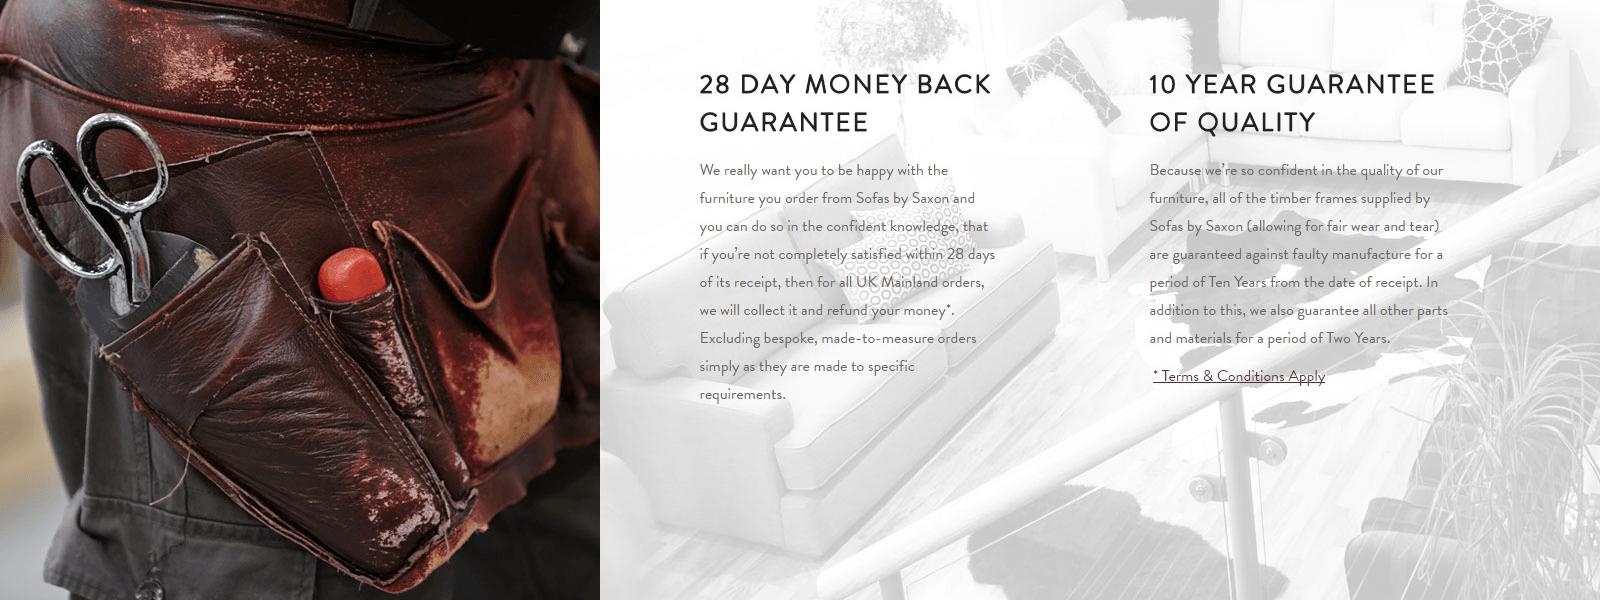 28 Day Money Back Guarantee